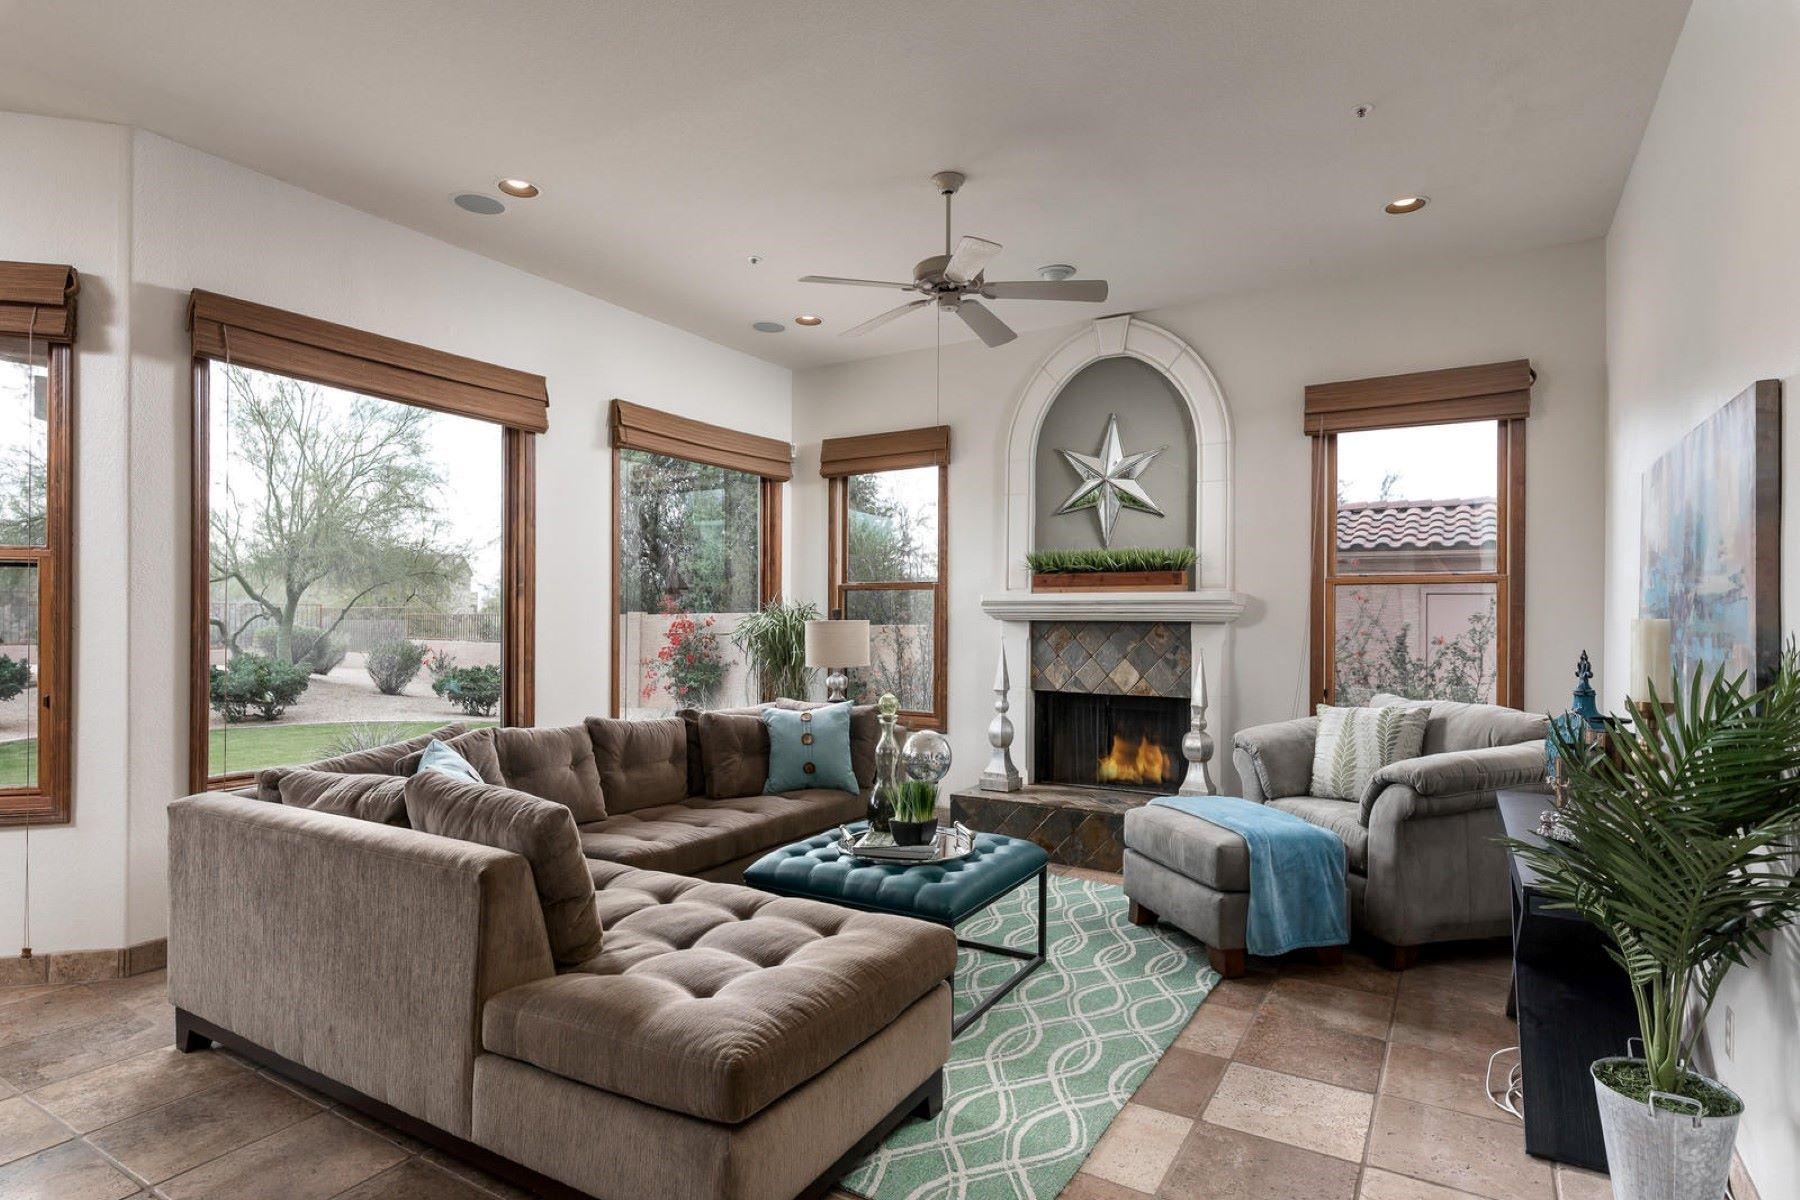 獨棟家庭住宅 為 出售 在 Beautiful Remodeled Vistana Home 8470 E Lariat Ln, Scottsdale, 亞利桑那州, 85255 美國